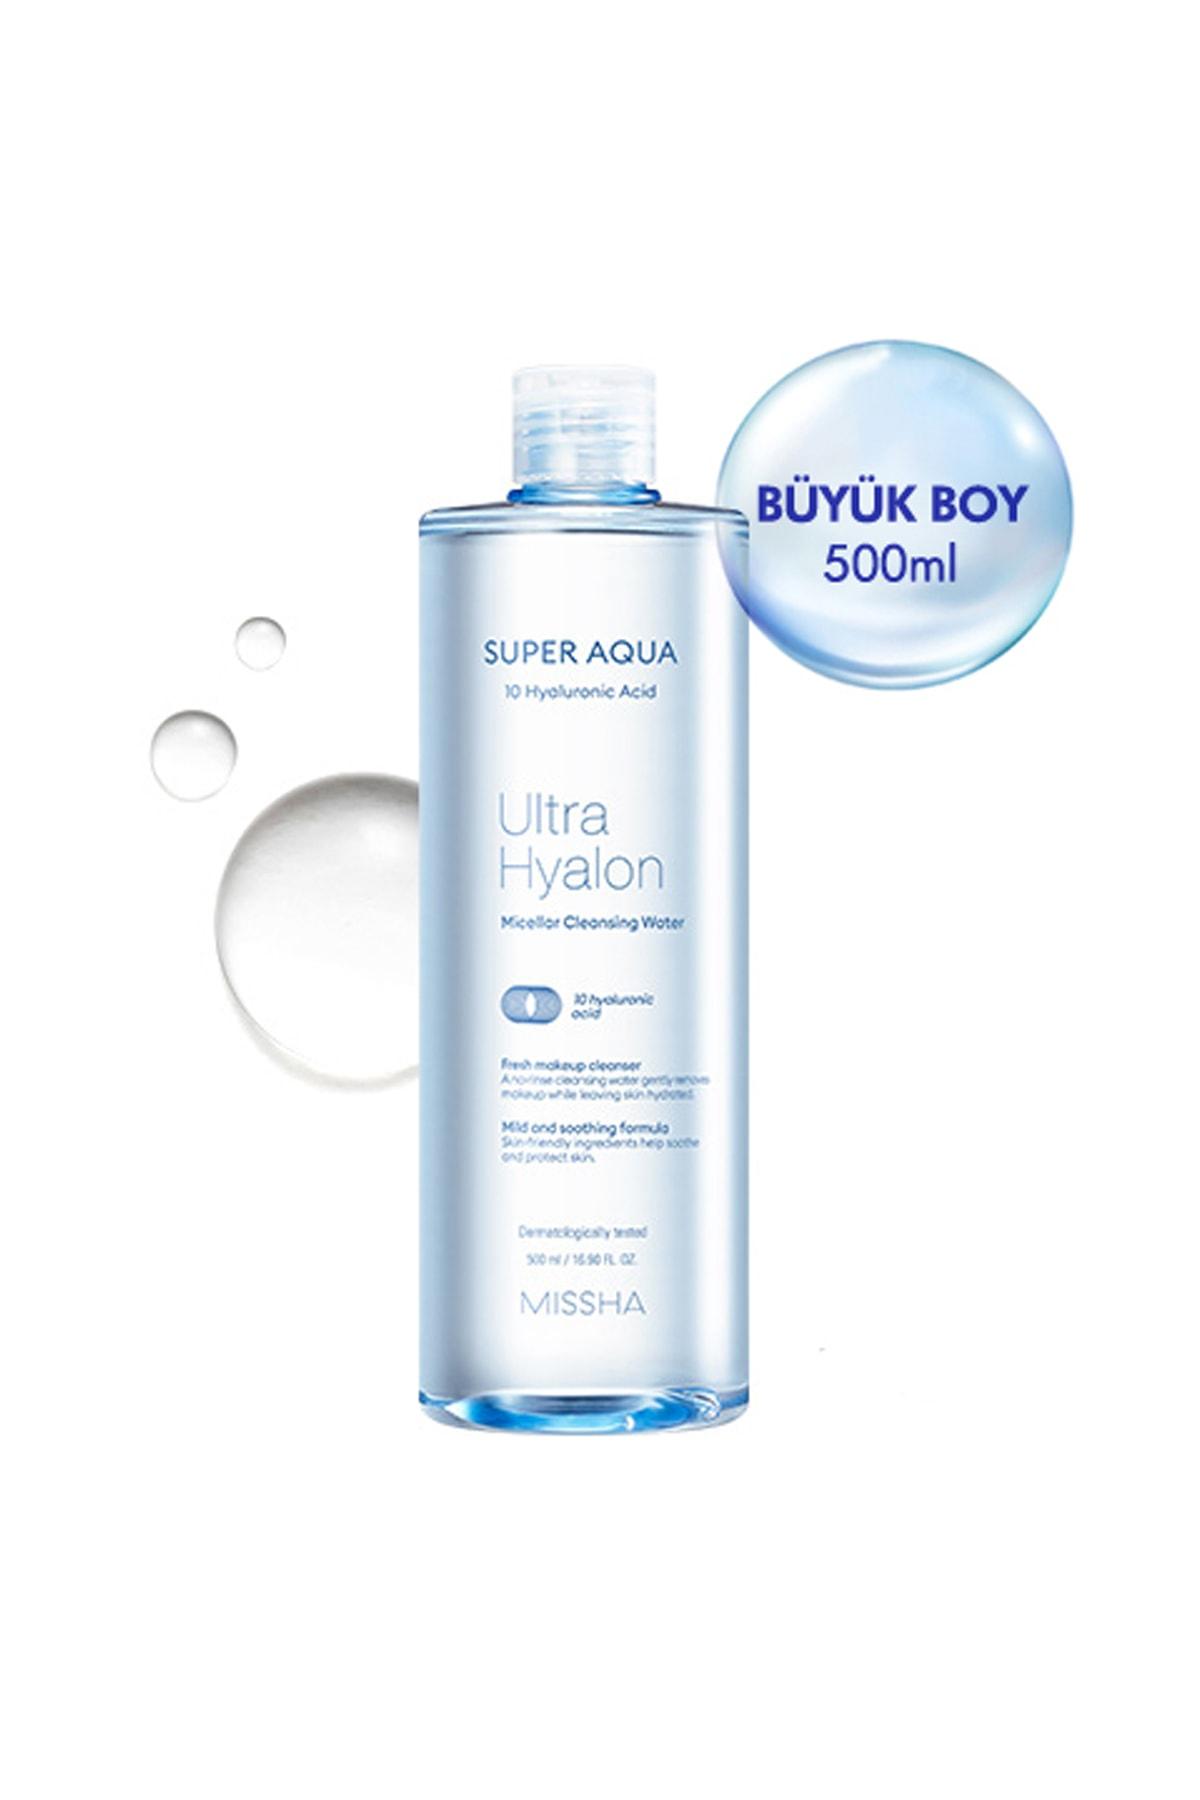 Missha 10 Çeşit Hyalüronik Asit İçeren Makyaj Temizleme Suyu 500ml Super Aqua Ultra Hyalron Cleansing Water